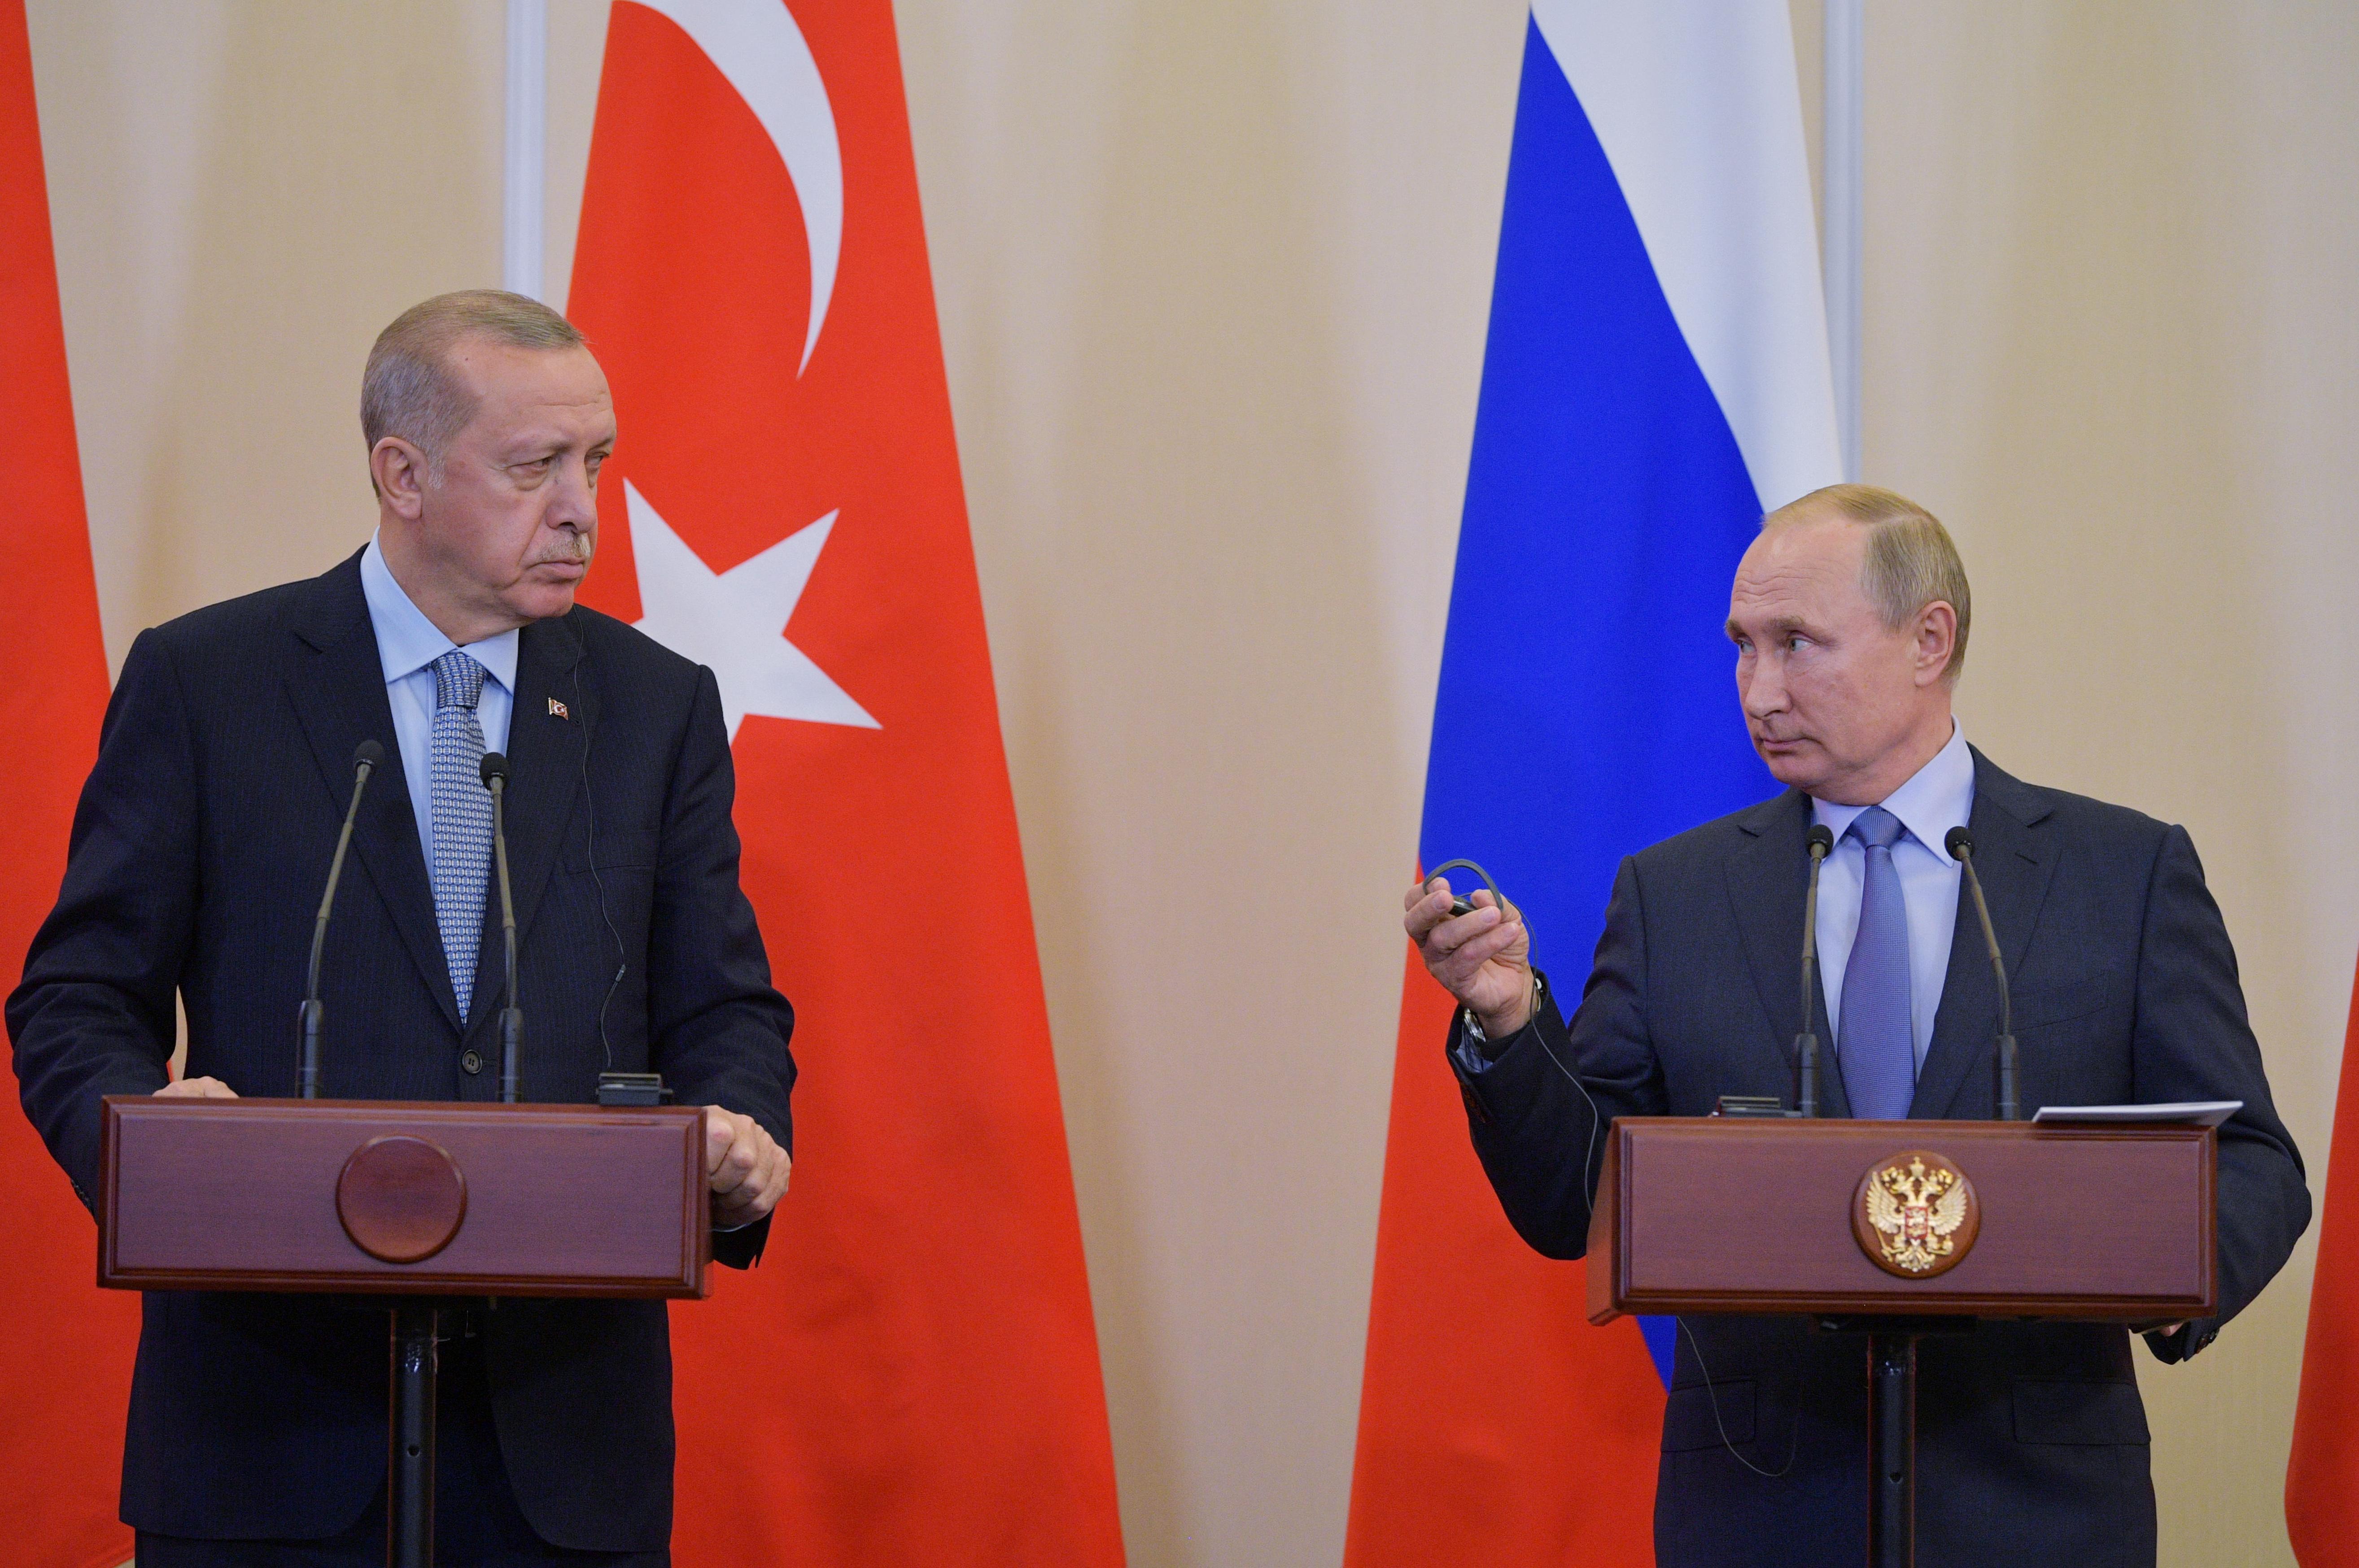 Russian police deploy in Syria's Kobani, Trump calls ceasefire...